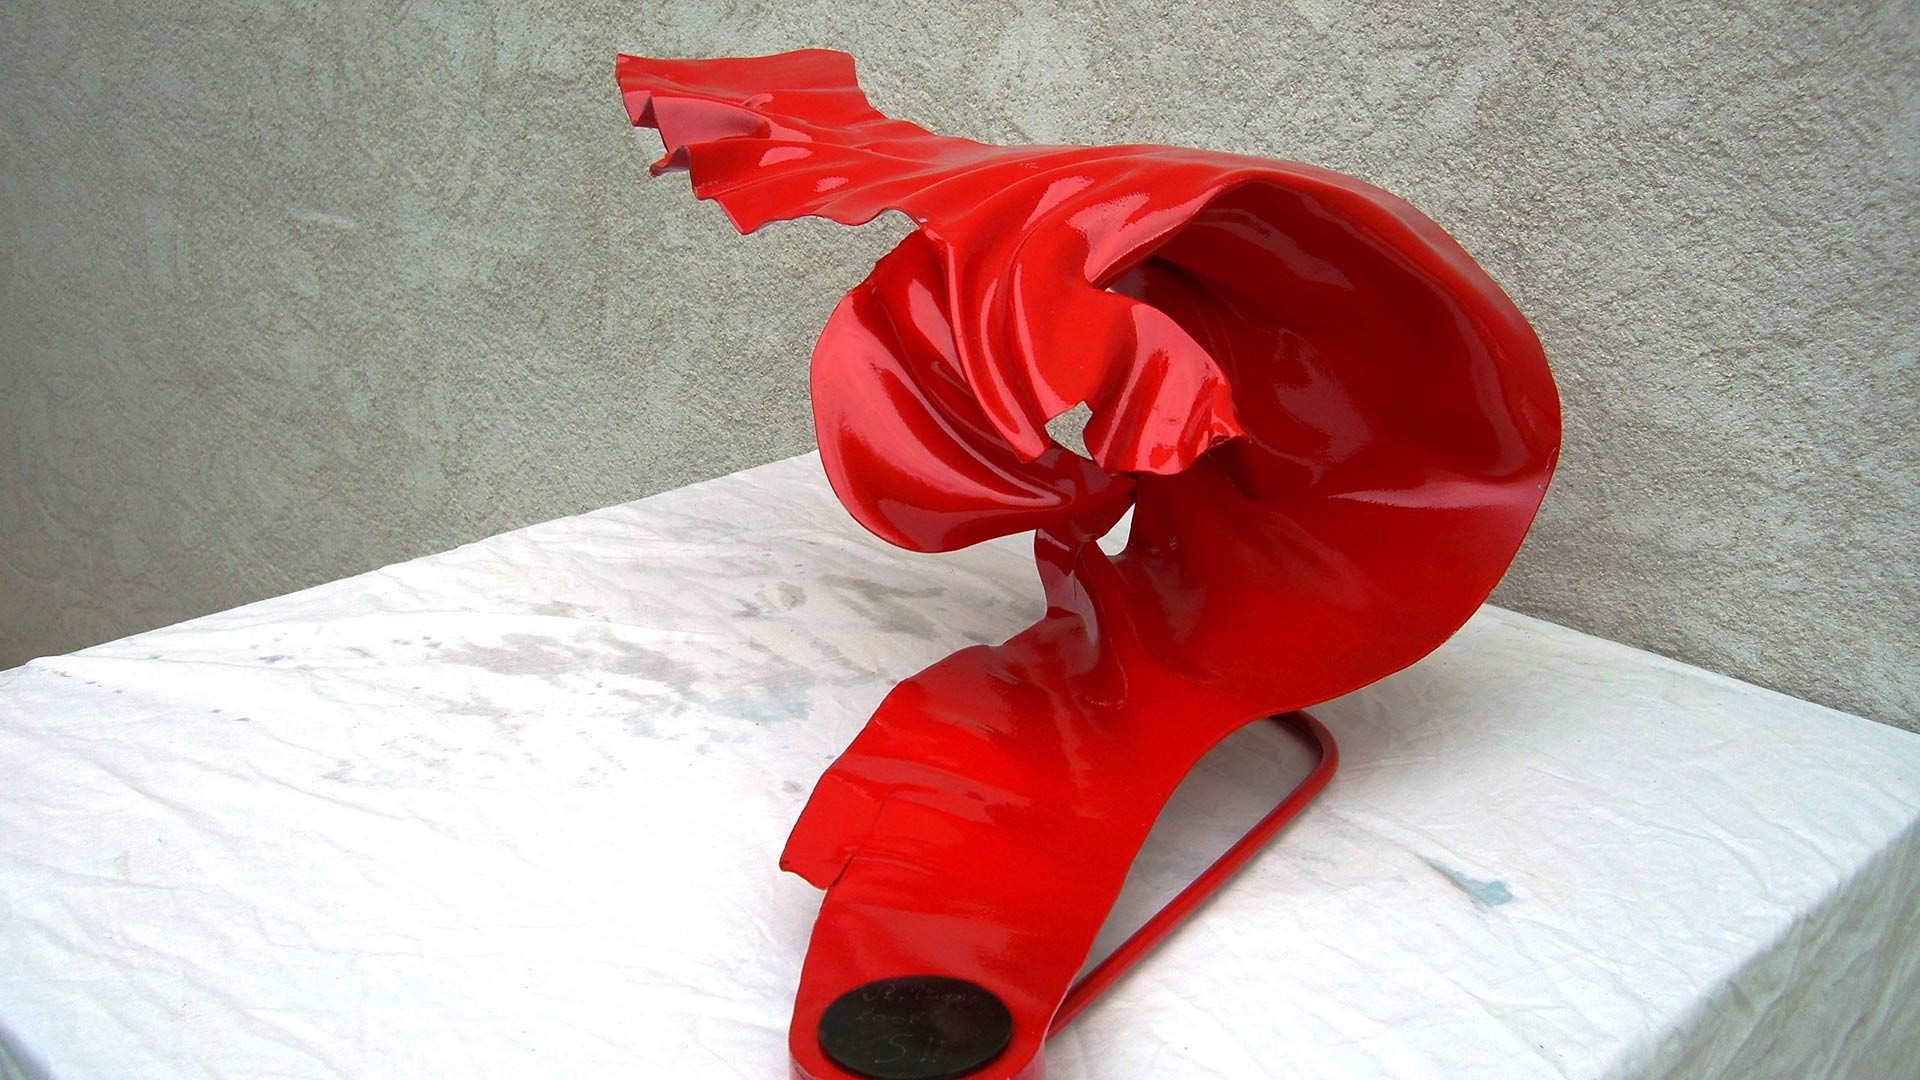 Sculpture en acier